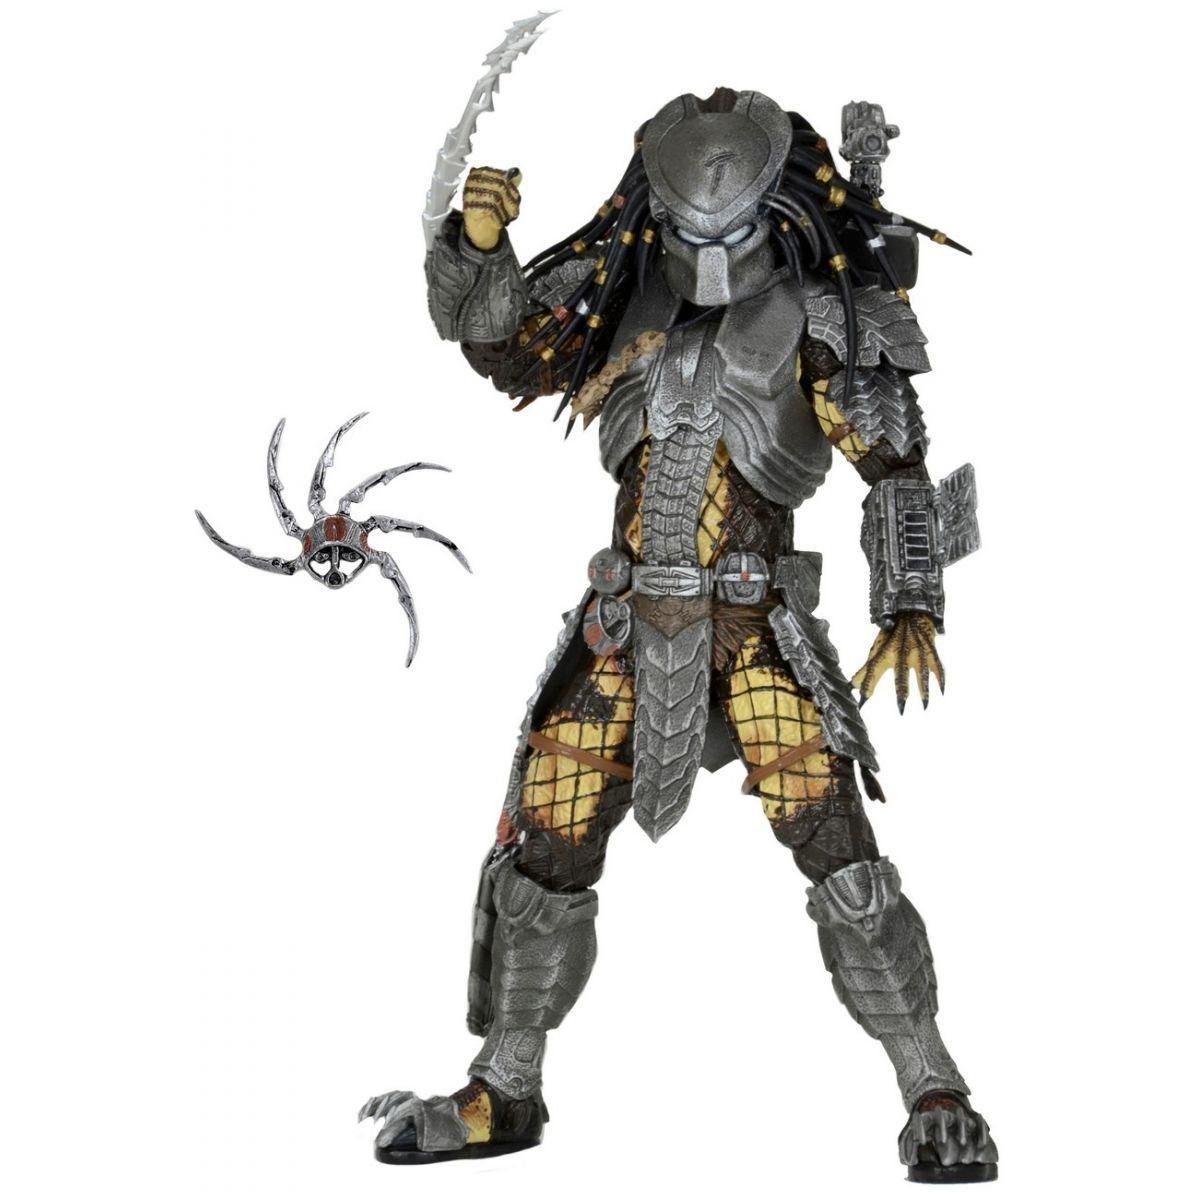 Boneco Masked Scar Predador / Predator: AvP (Alien vs Predador / Predator): Series 15 Escala 1/10 - NECA